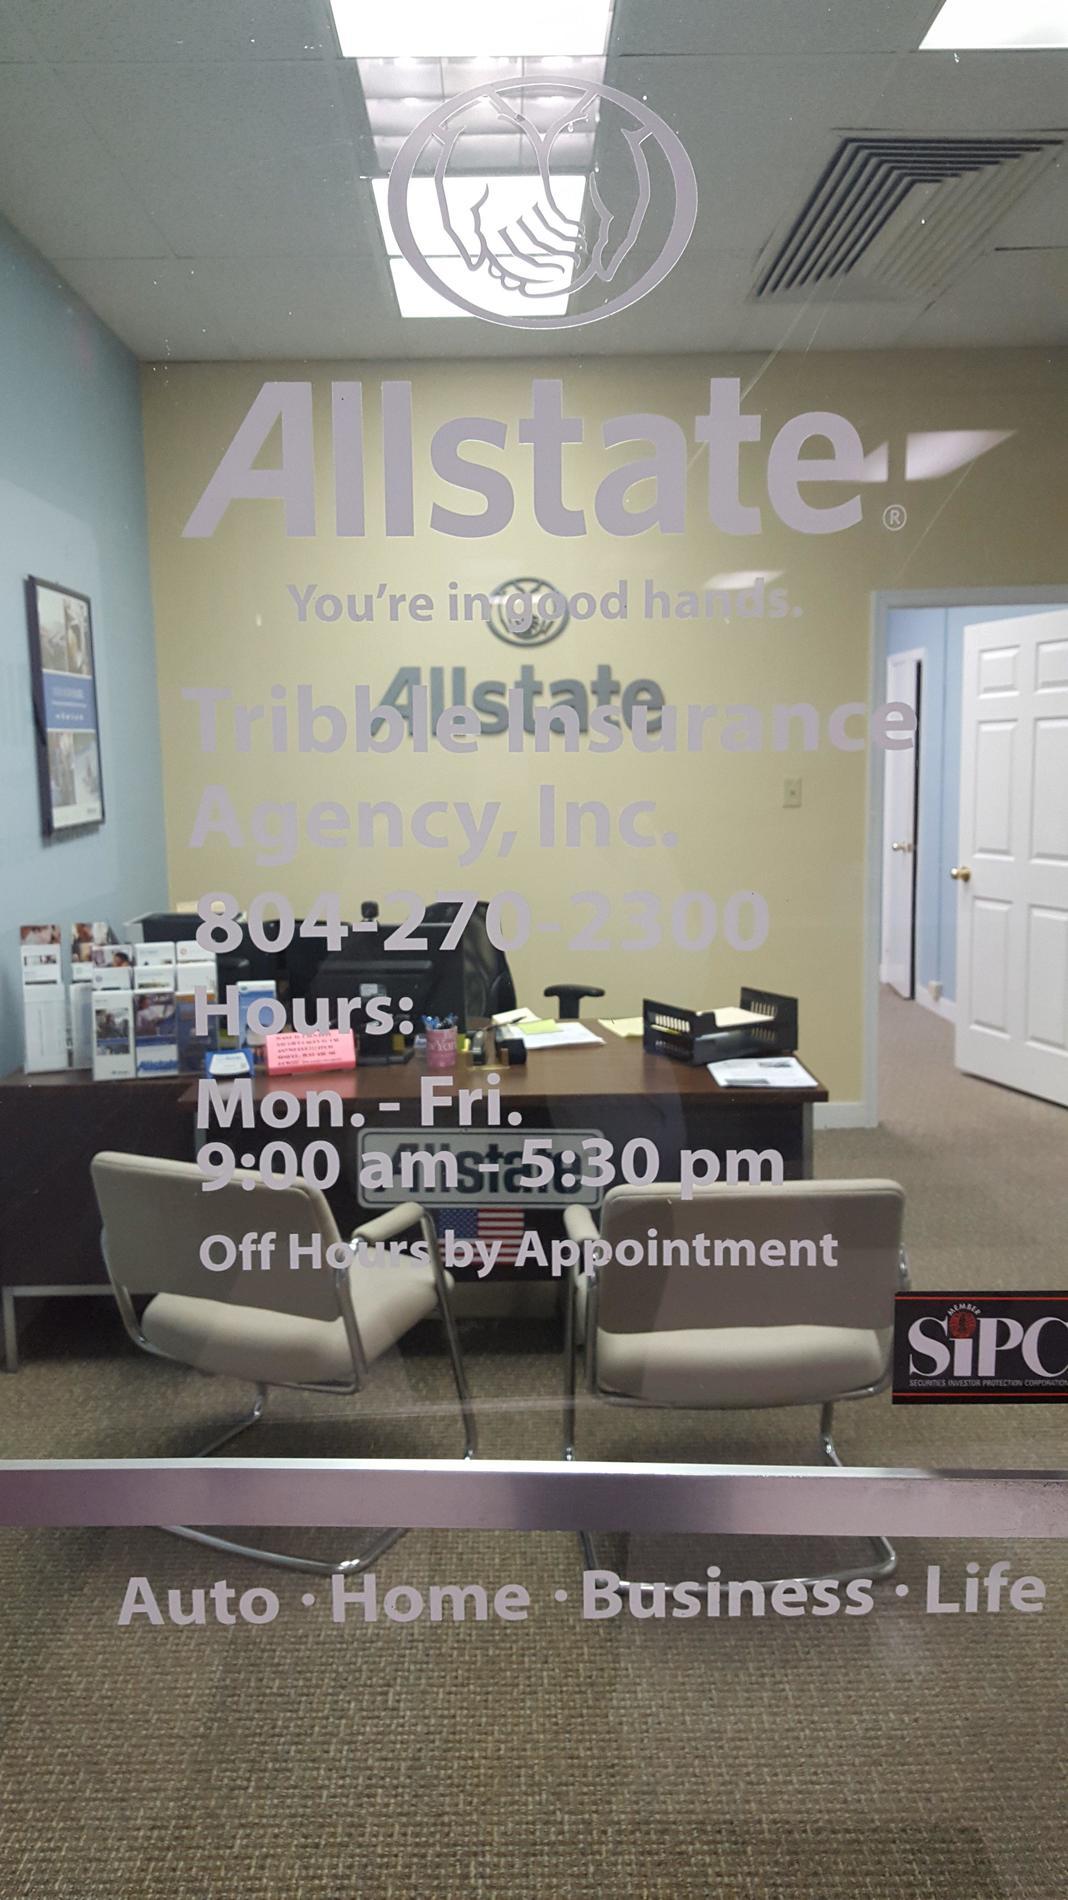 Allstate Car Insurance In Richmond Va Trip Tribble